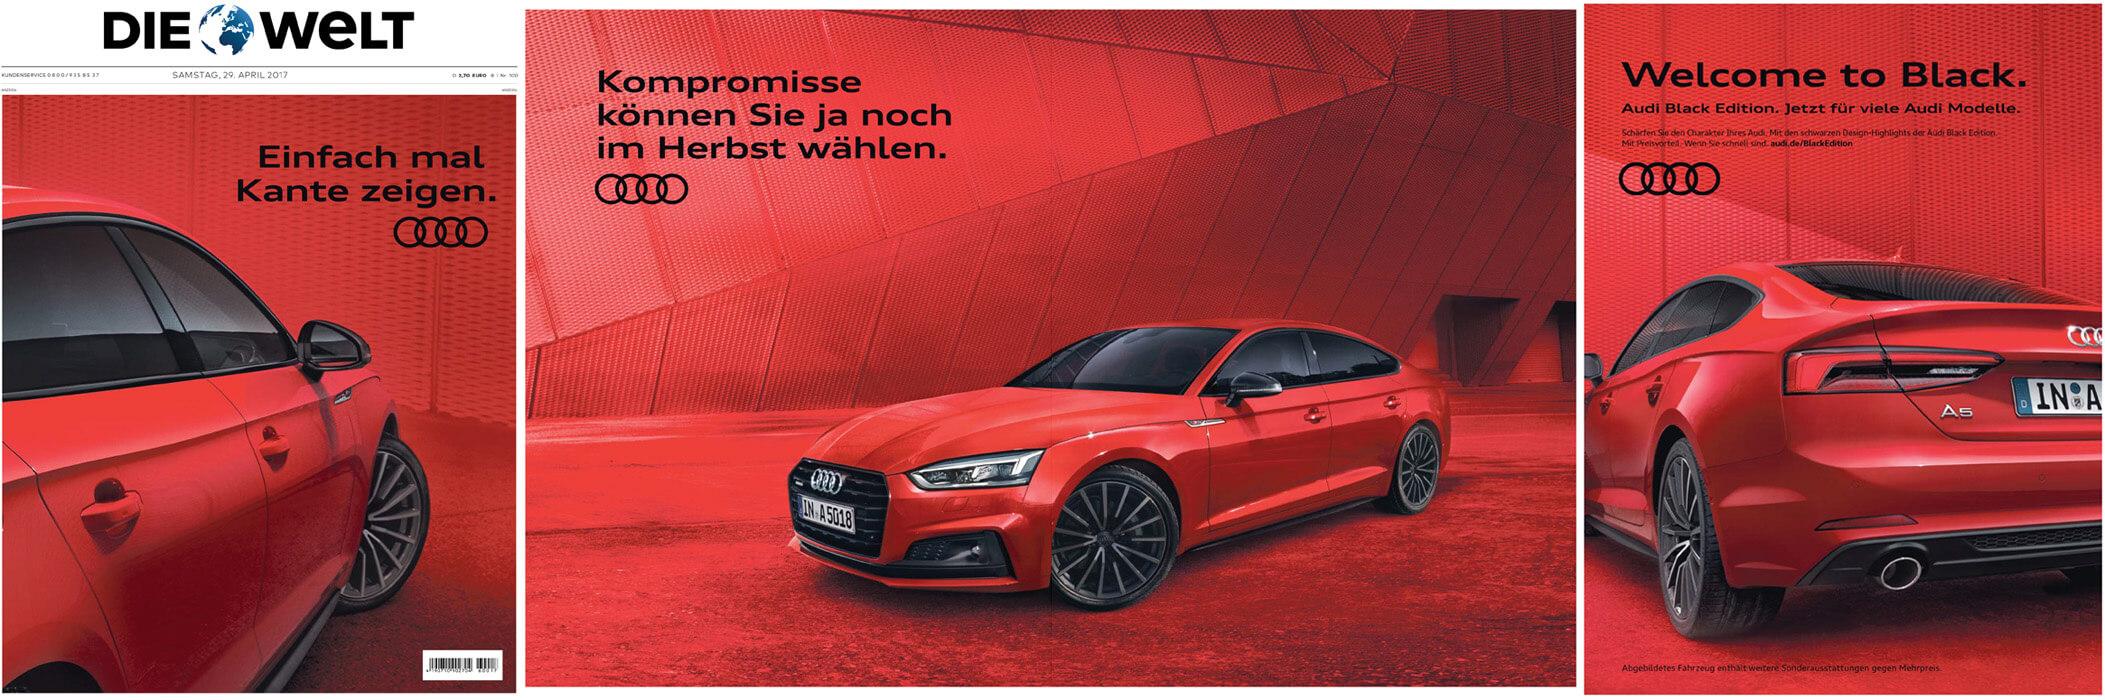 04_Audi Black Edition Strecke